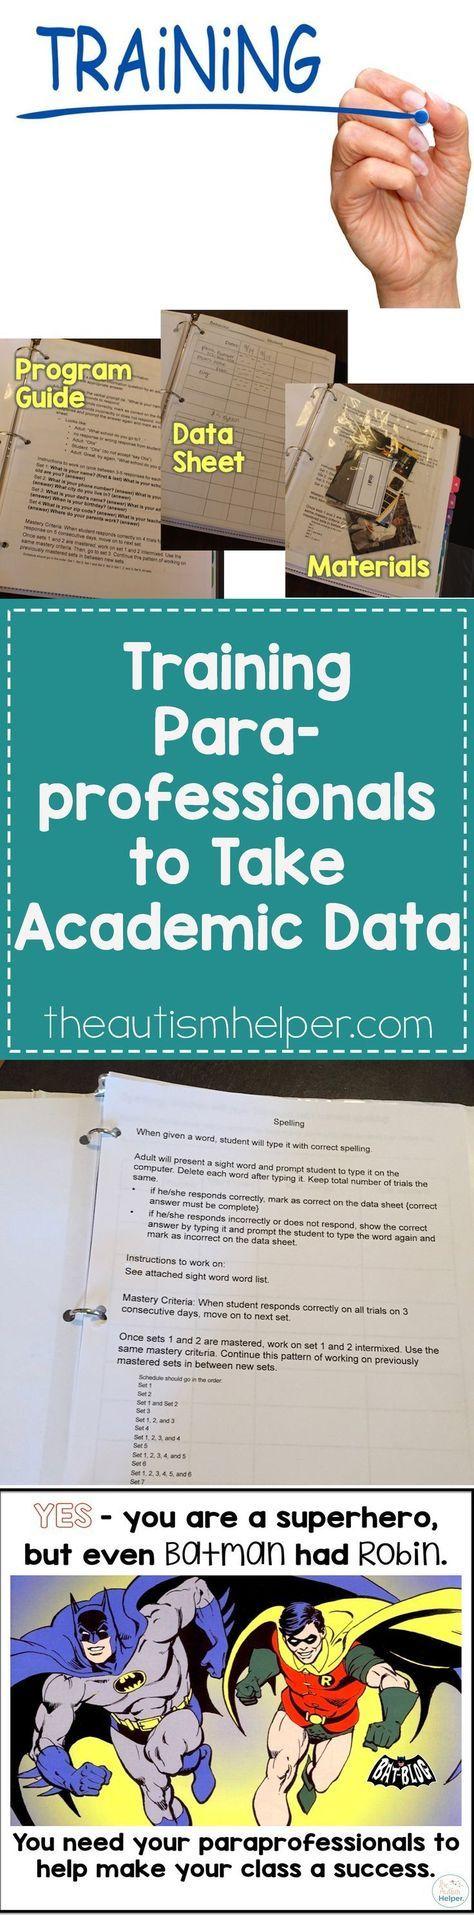 Training Paraprofessionals to Take Academic Data 87